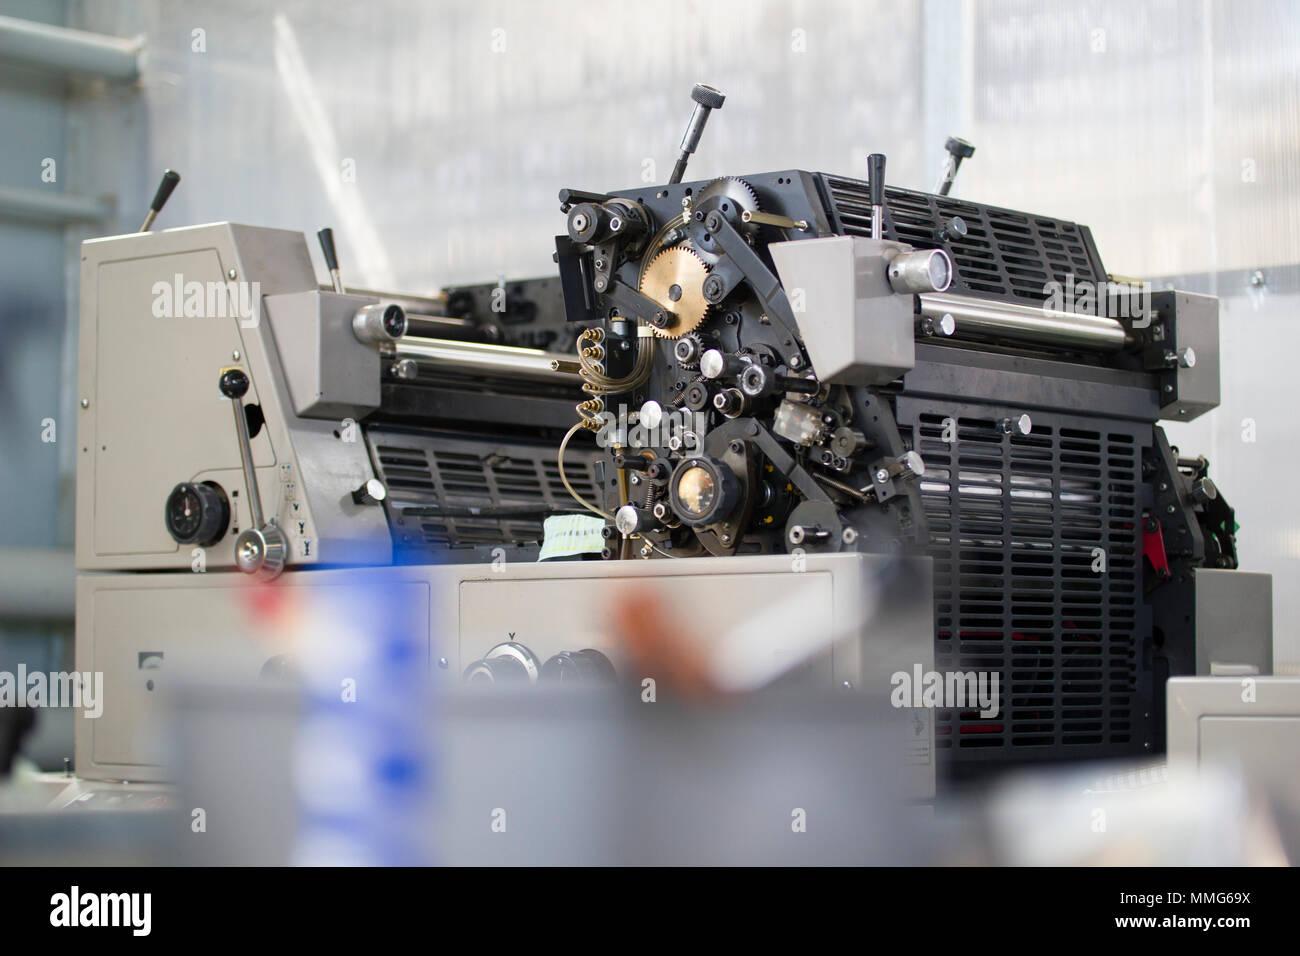 Modern Printing Press Machine In A House